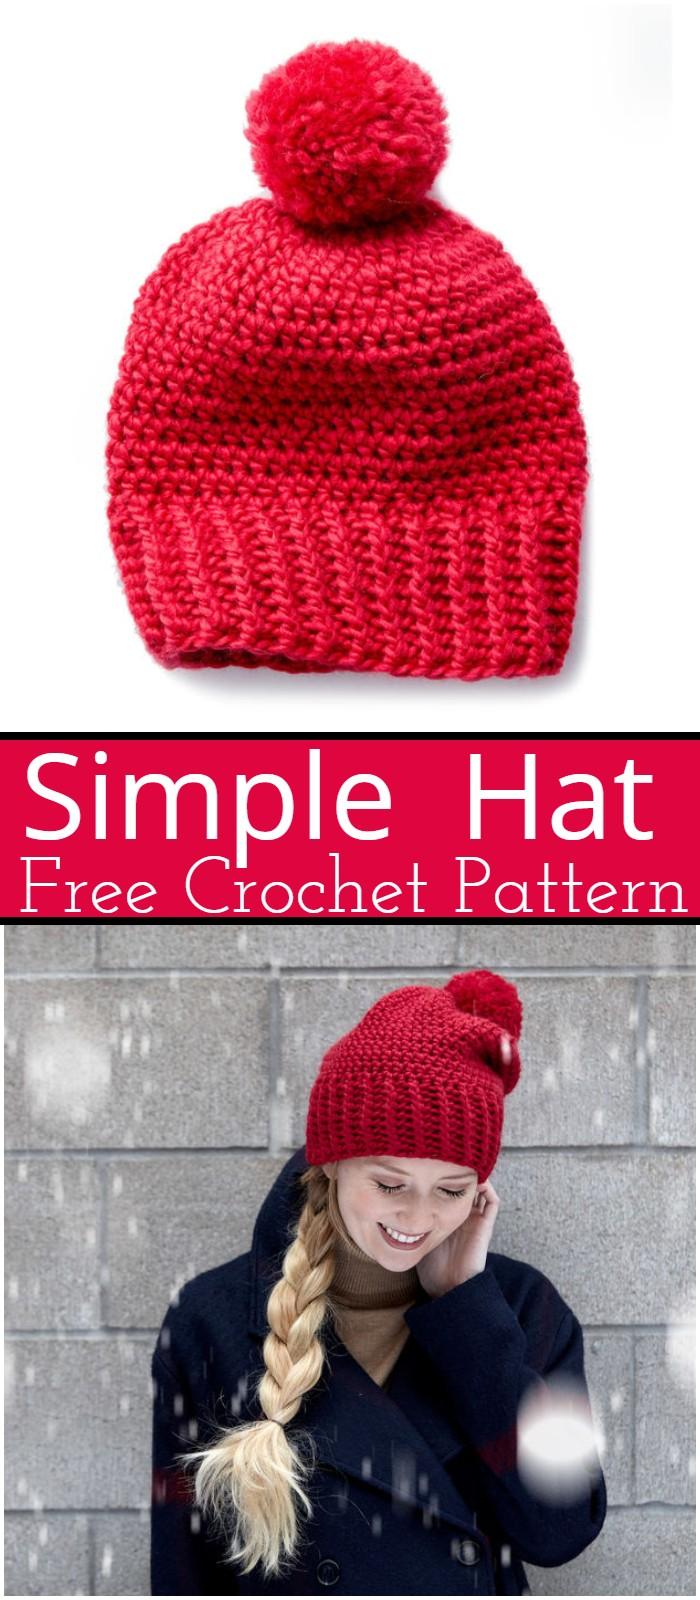 Simple Crochet Hat Patterns